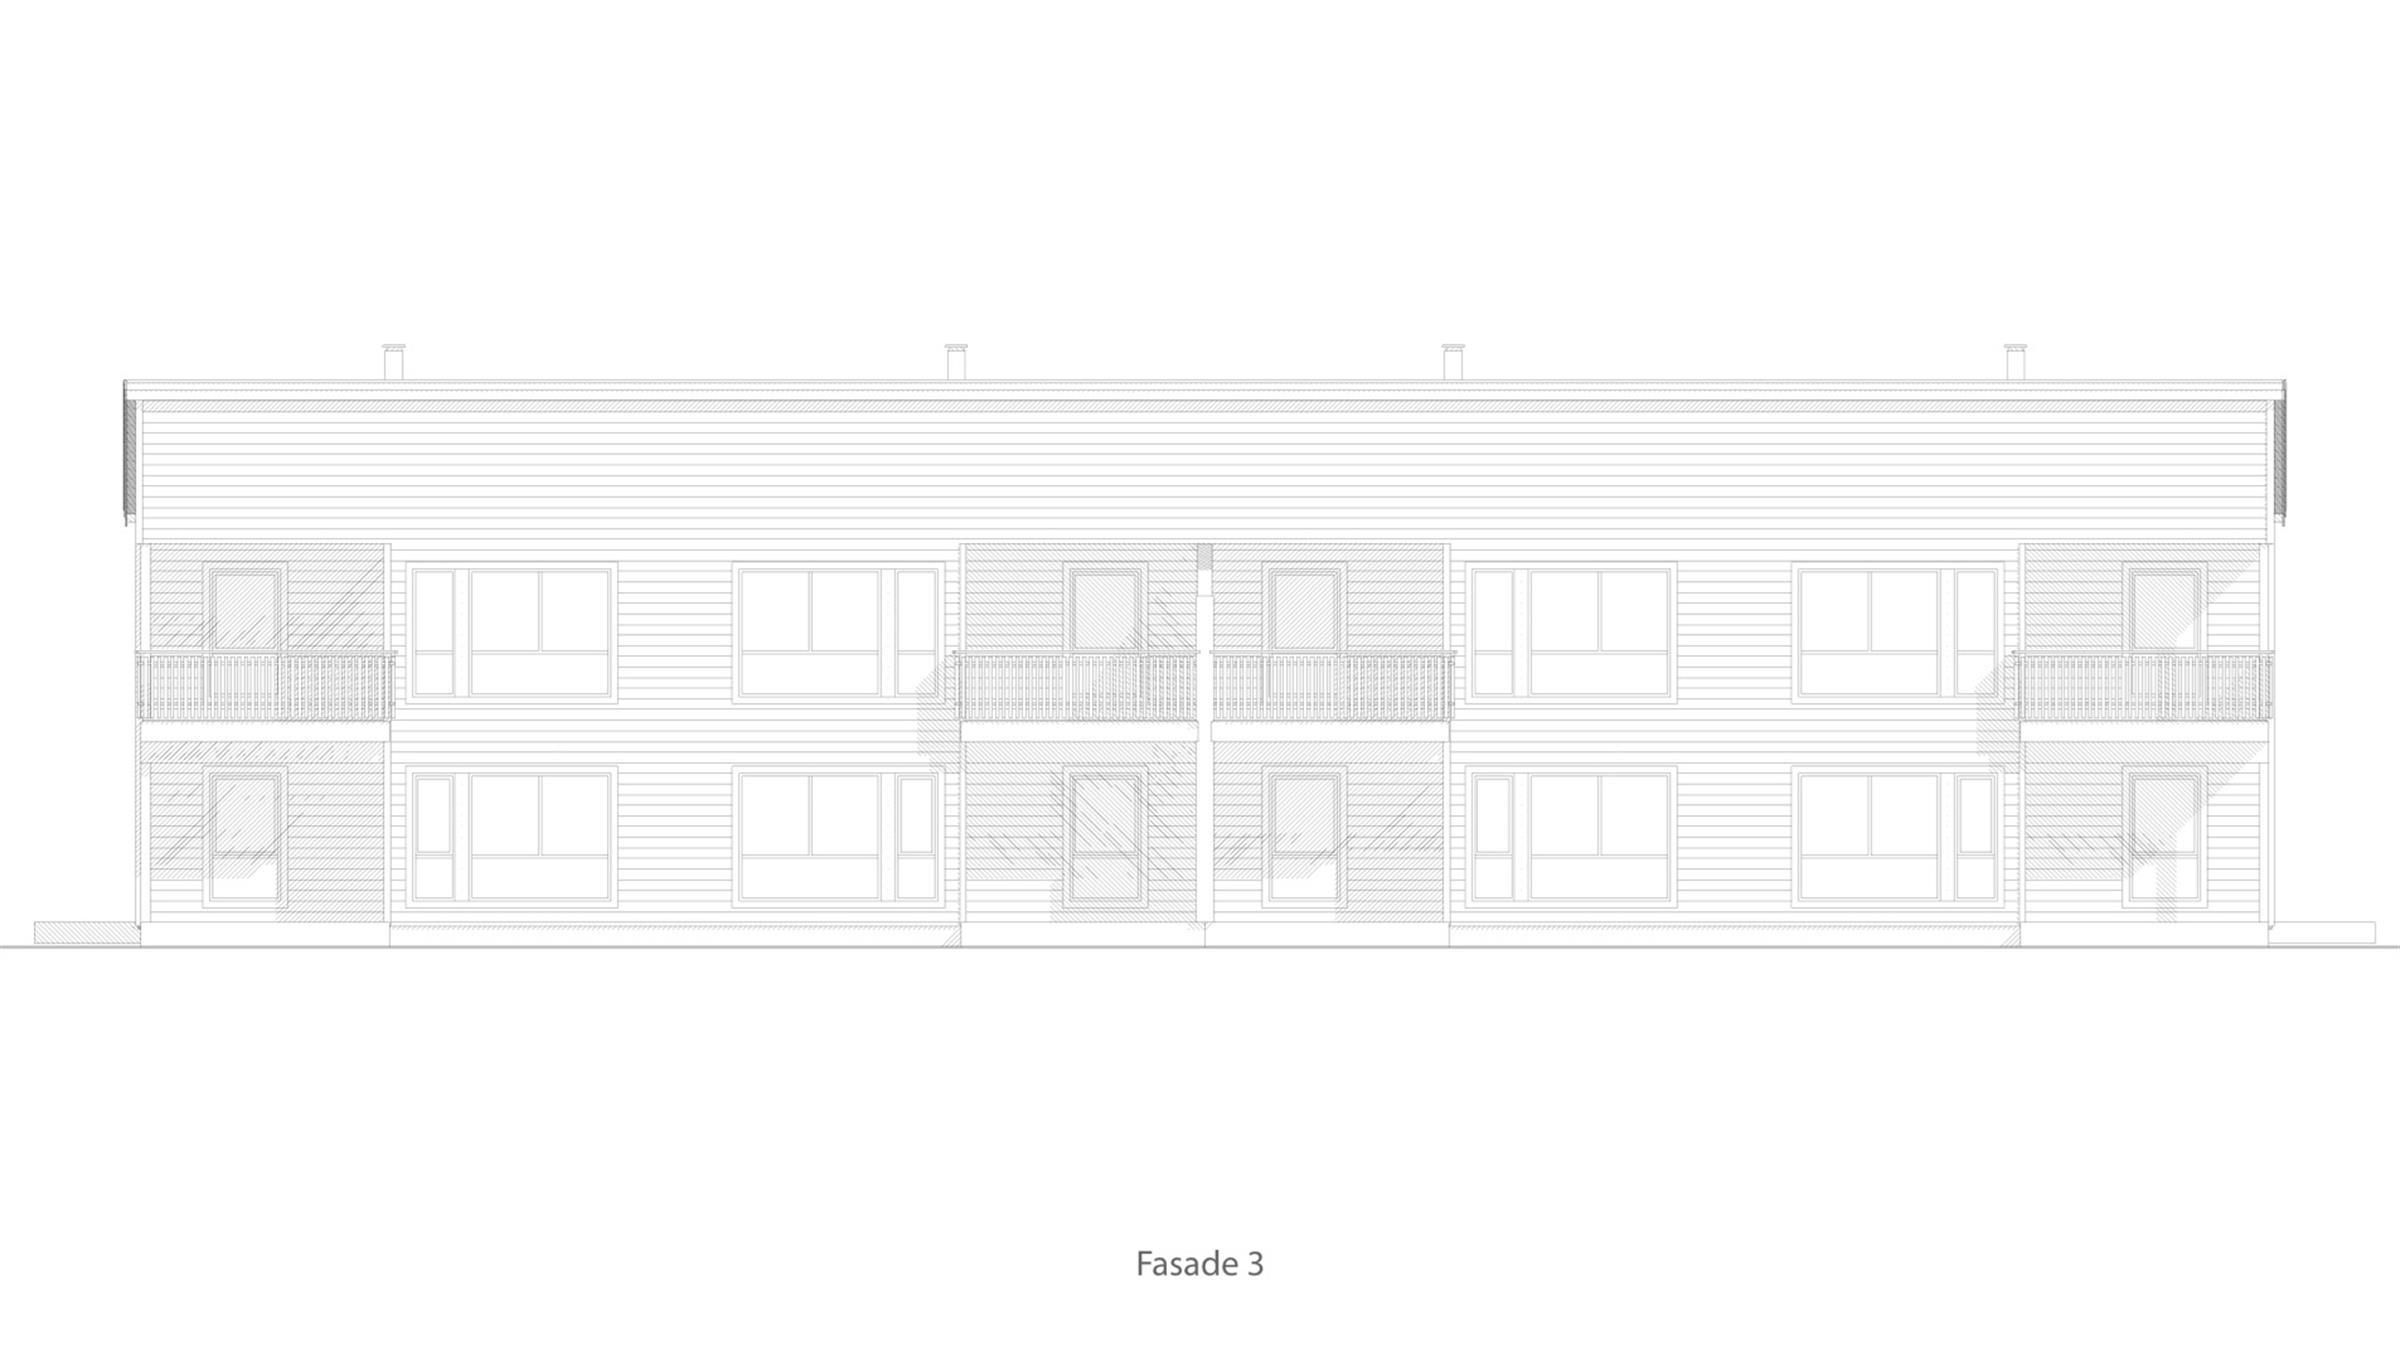 Egersund fasade 3